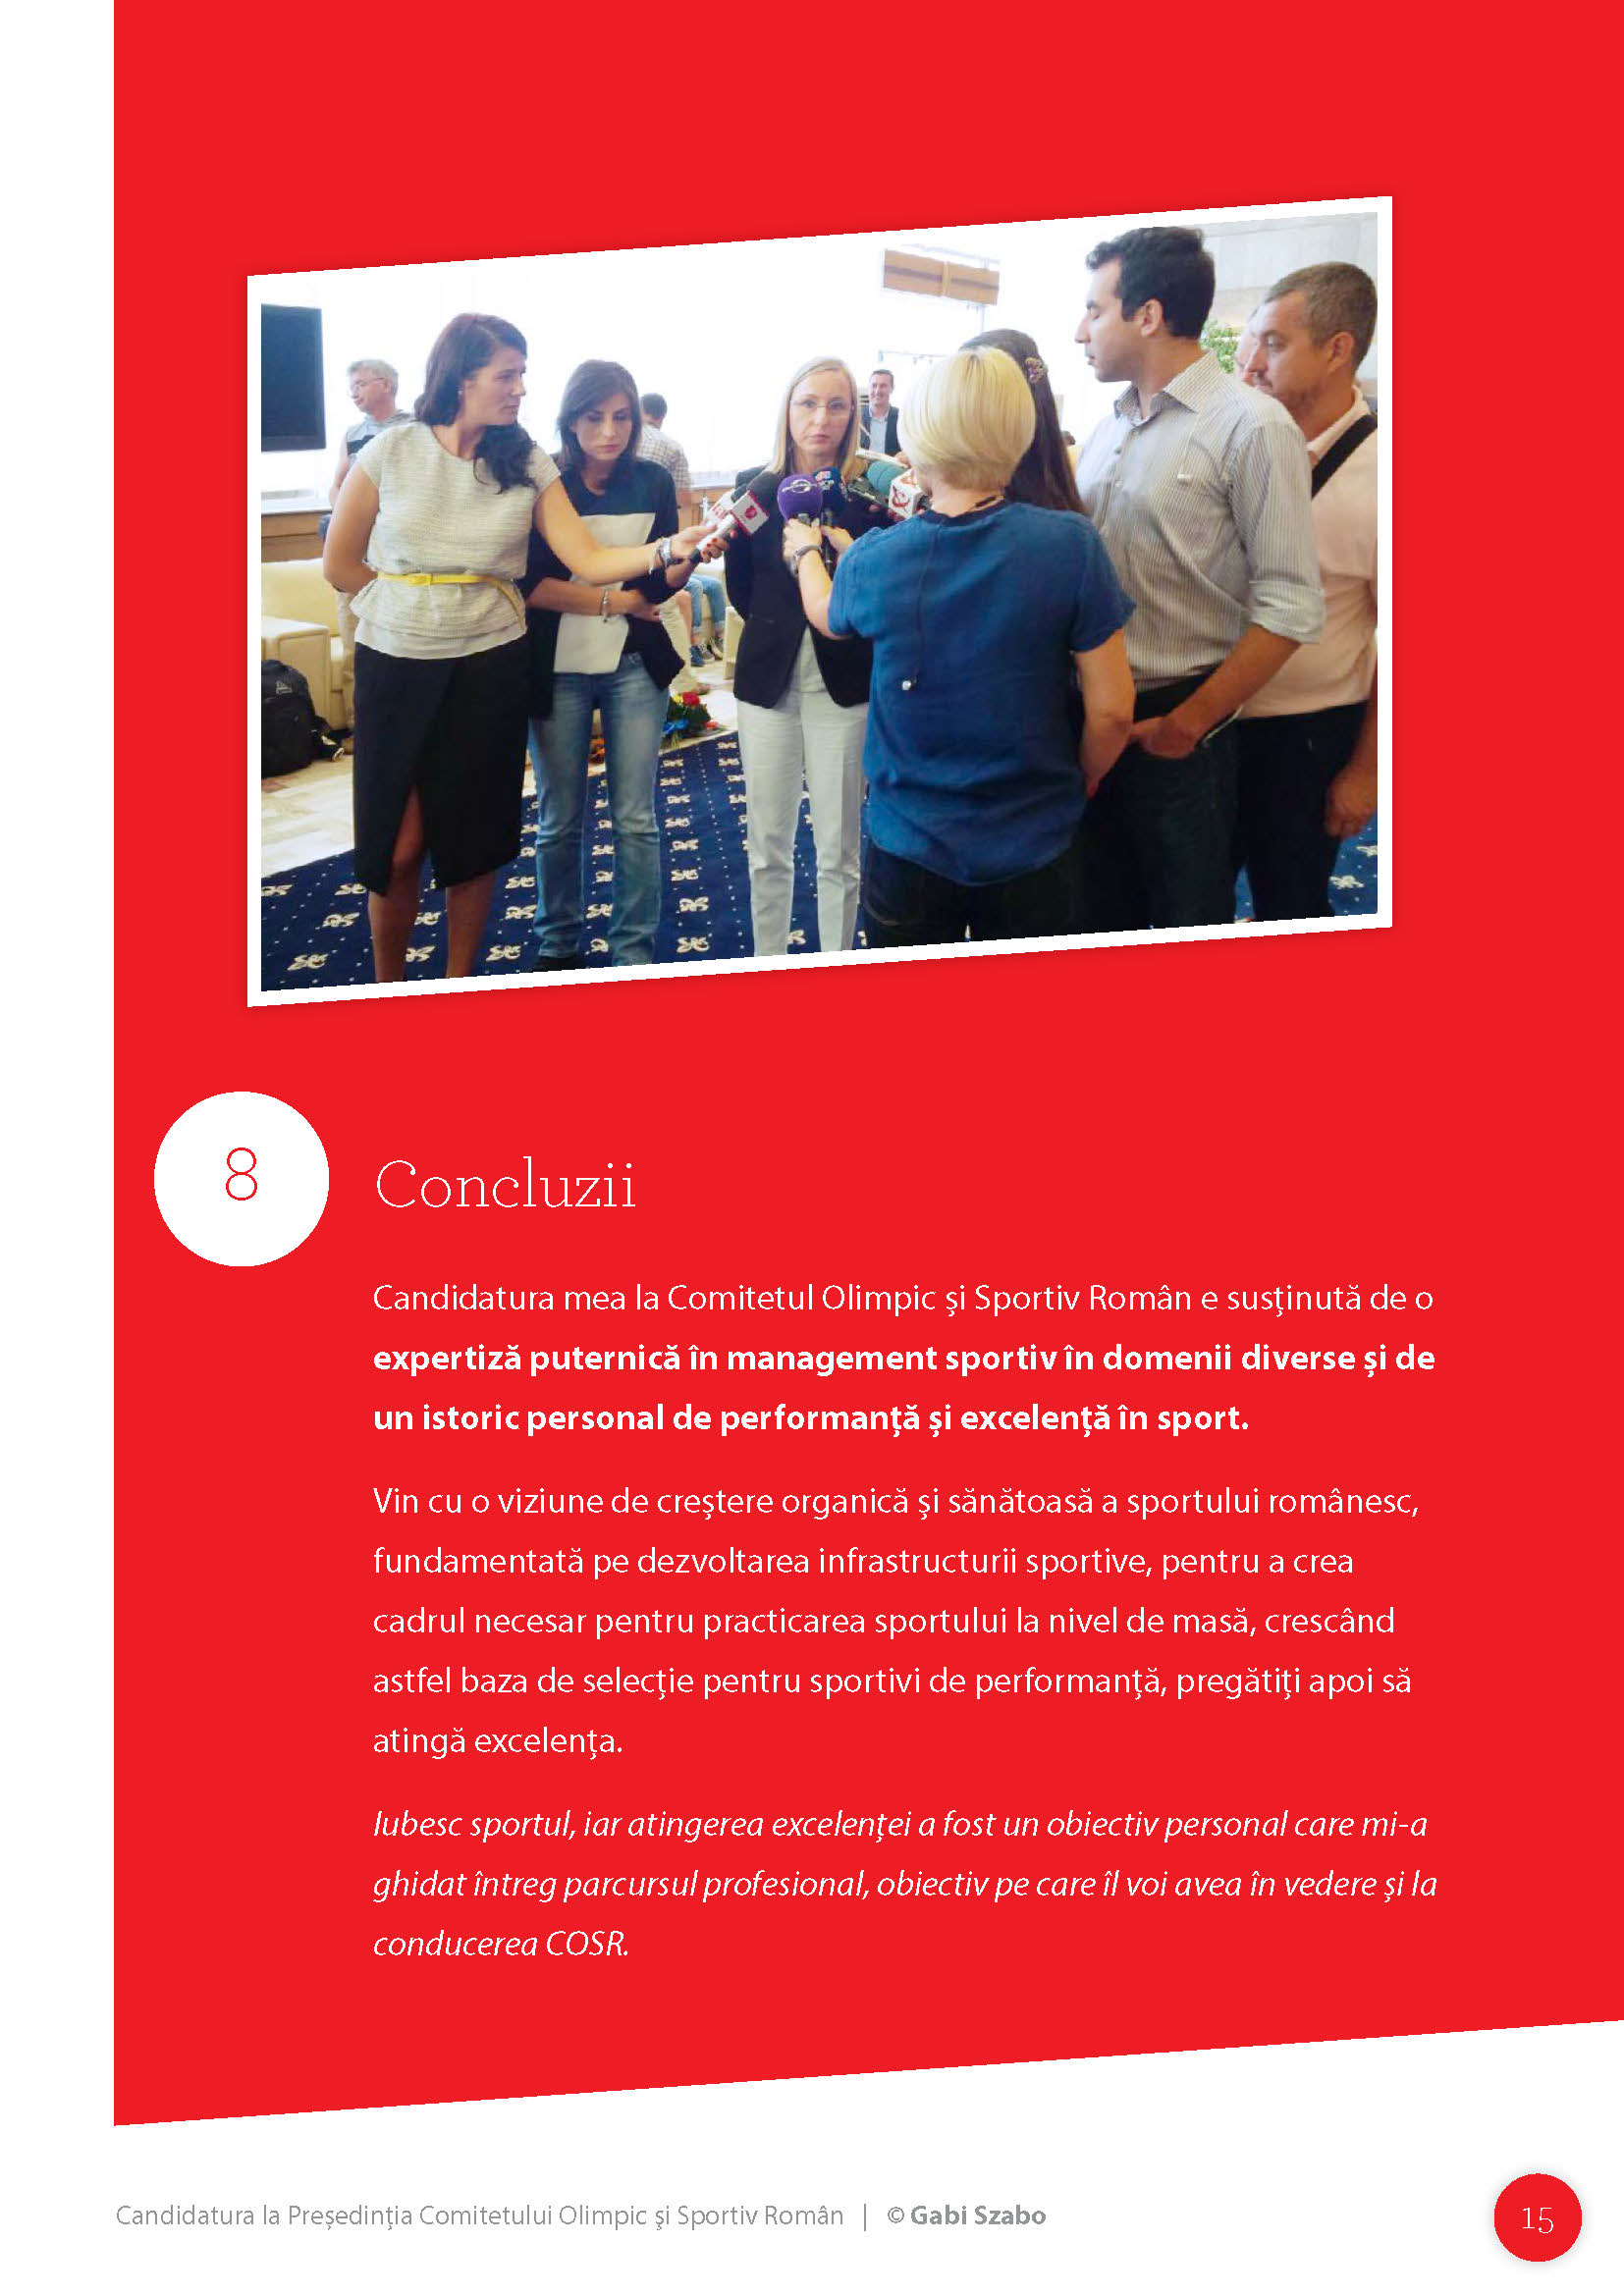 spv02_candidatura-cosr_1-6_pco_13oct16_page_15